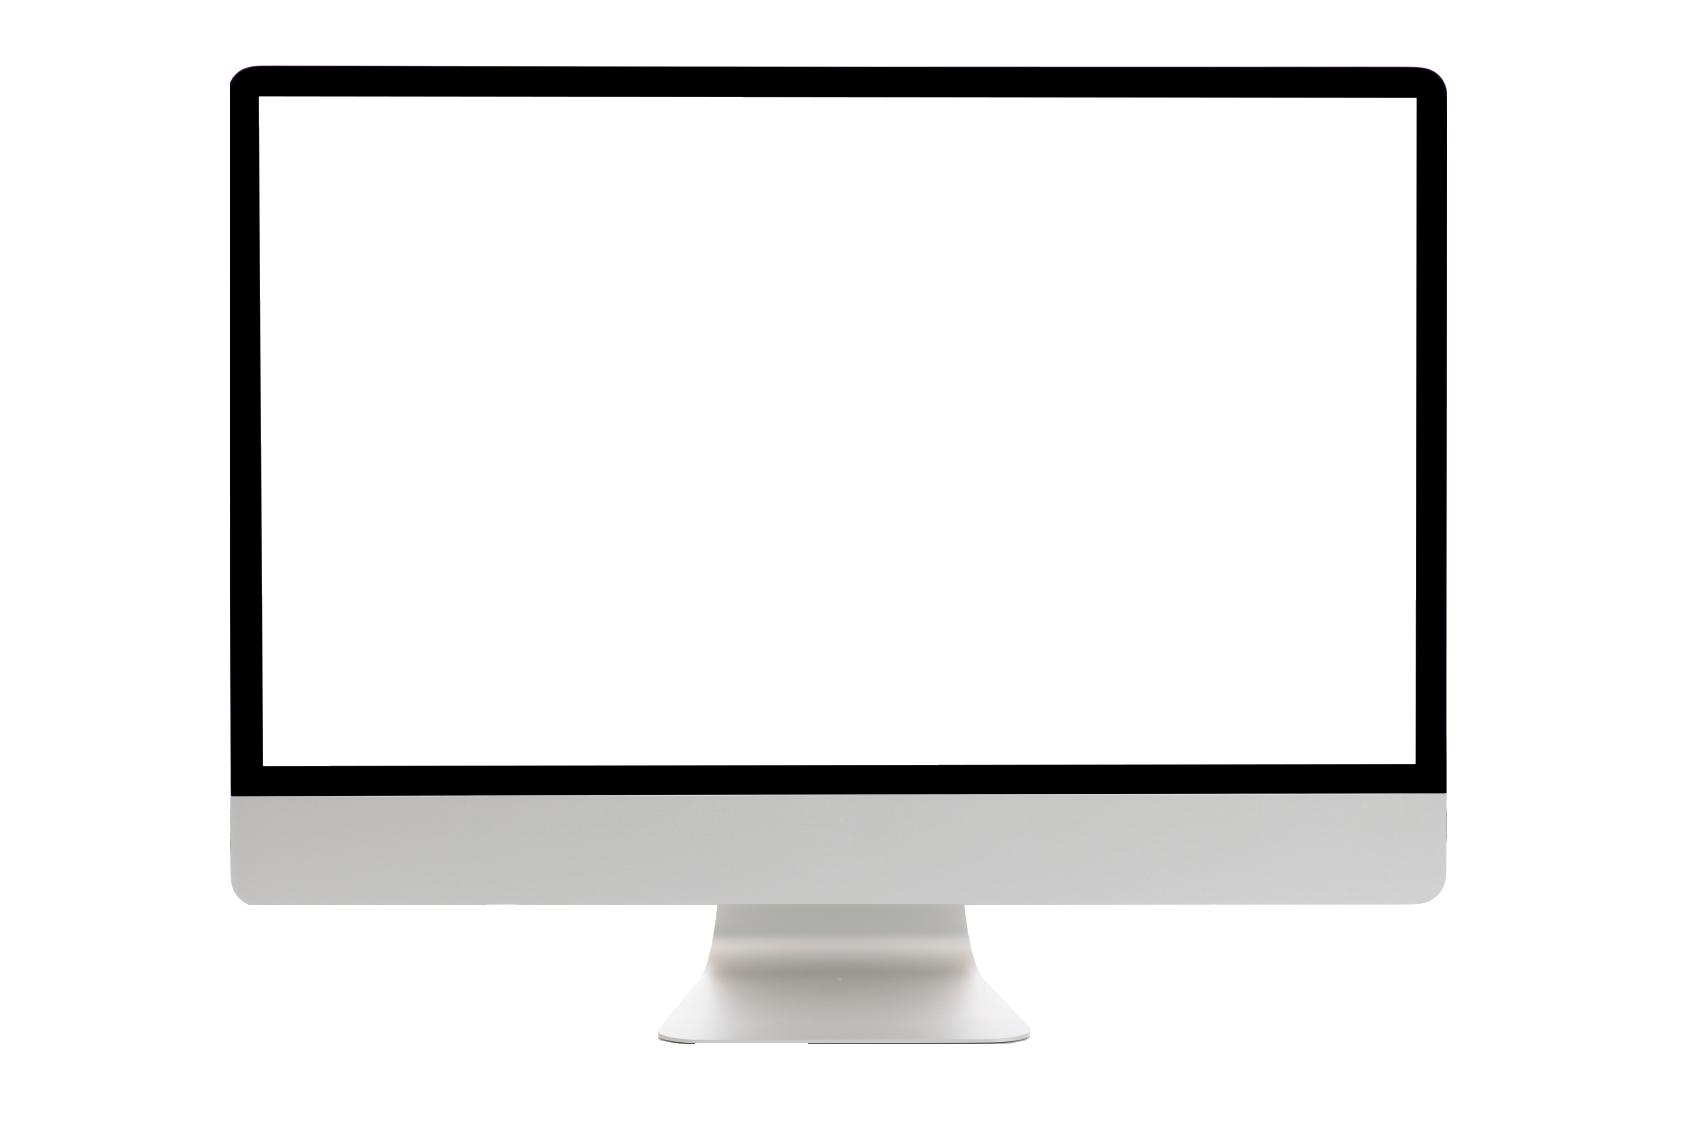 mac desktop template png Google Search Mac desktop